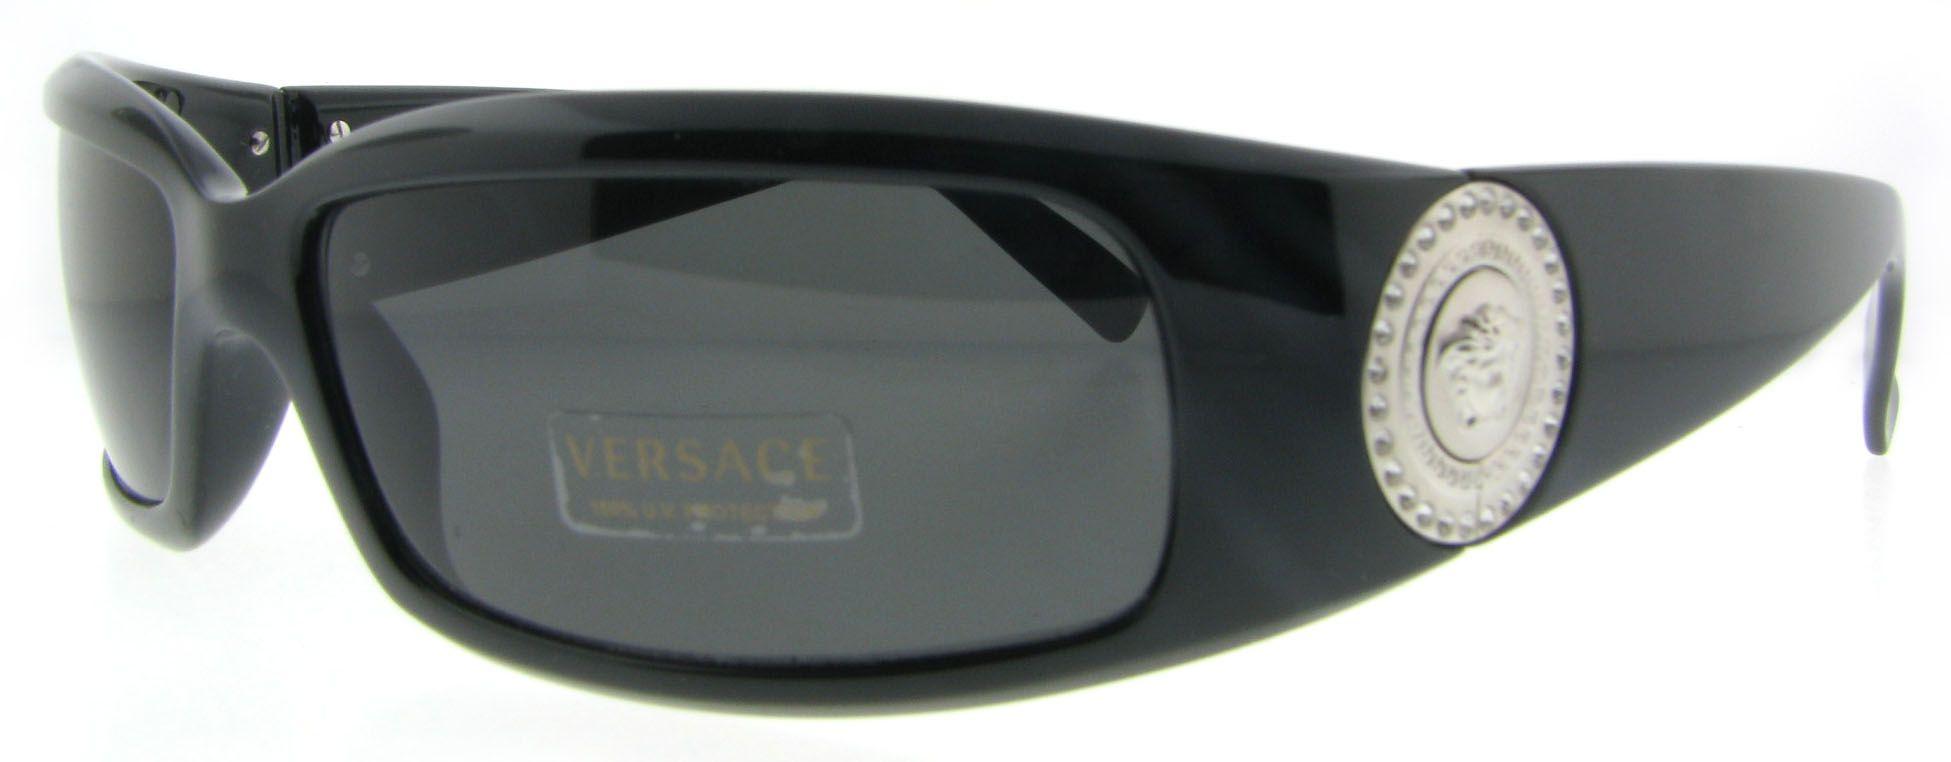 e3a1c2169e12 Versace Ve 4044b Gb1 87 Black Ve4044 B Sunglasses